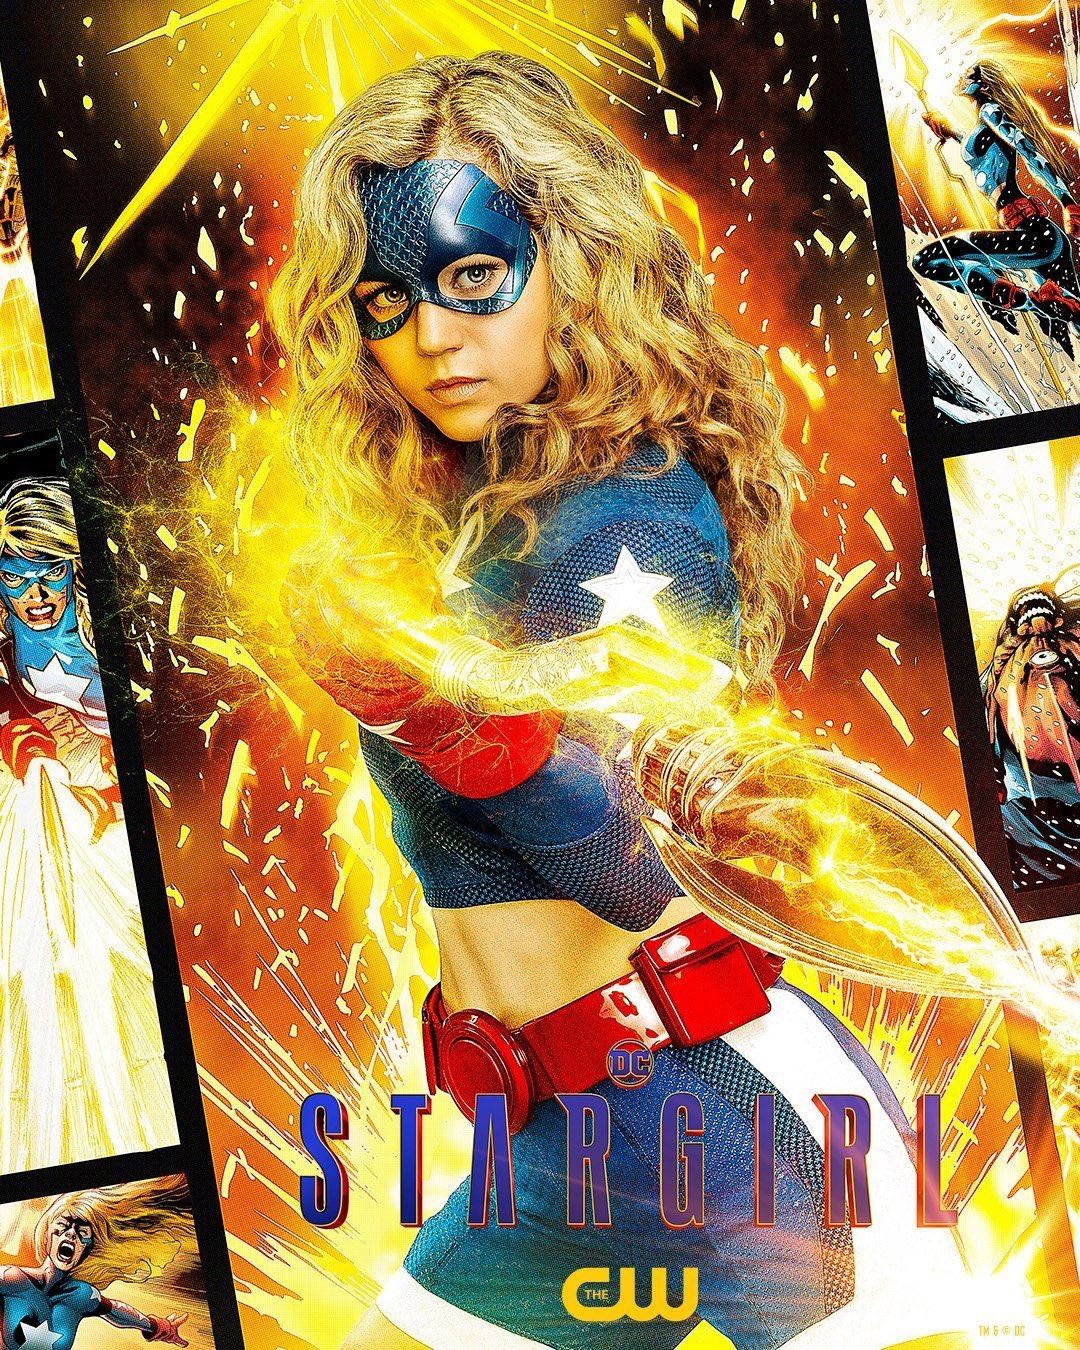 Courtney Whitmore/Stargirl (Brec Bassinger) en un póster promocional de la temporada 2 de Stargirl. Imagen: impawards.com